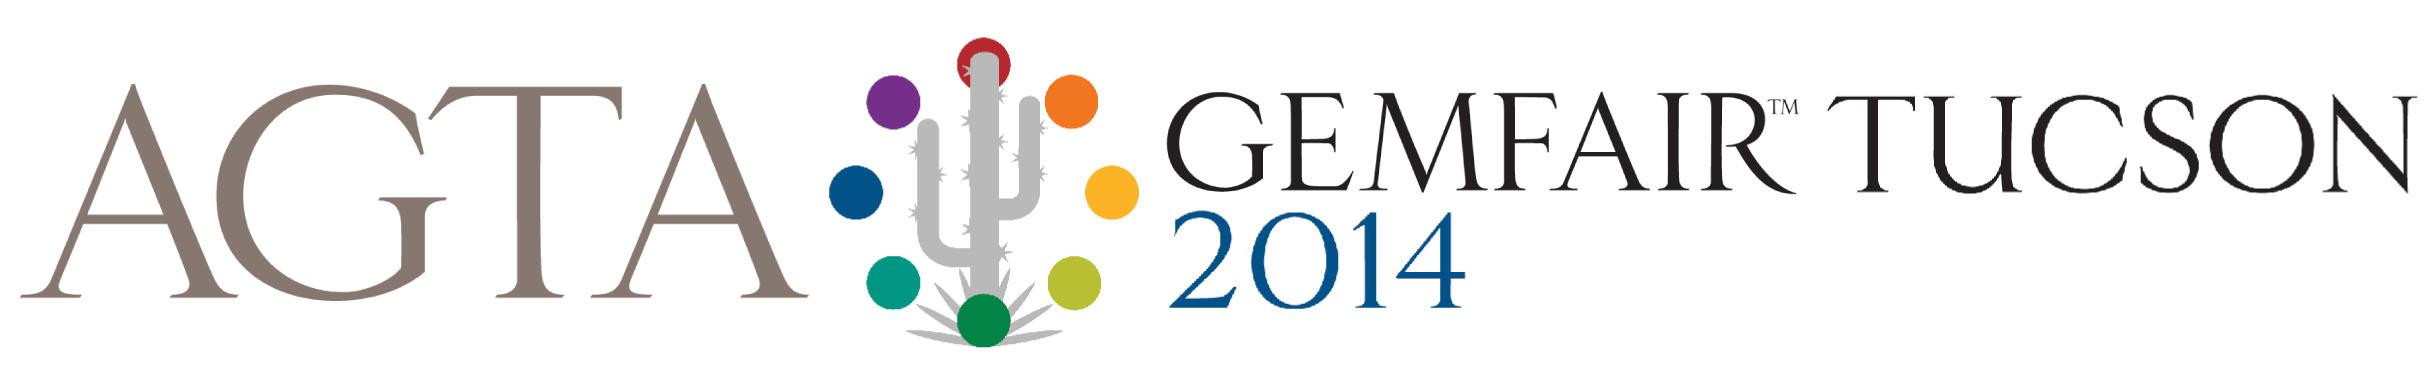 AGTA GemFair 2014